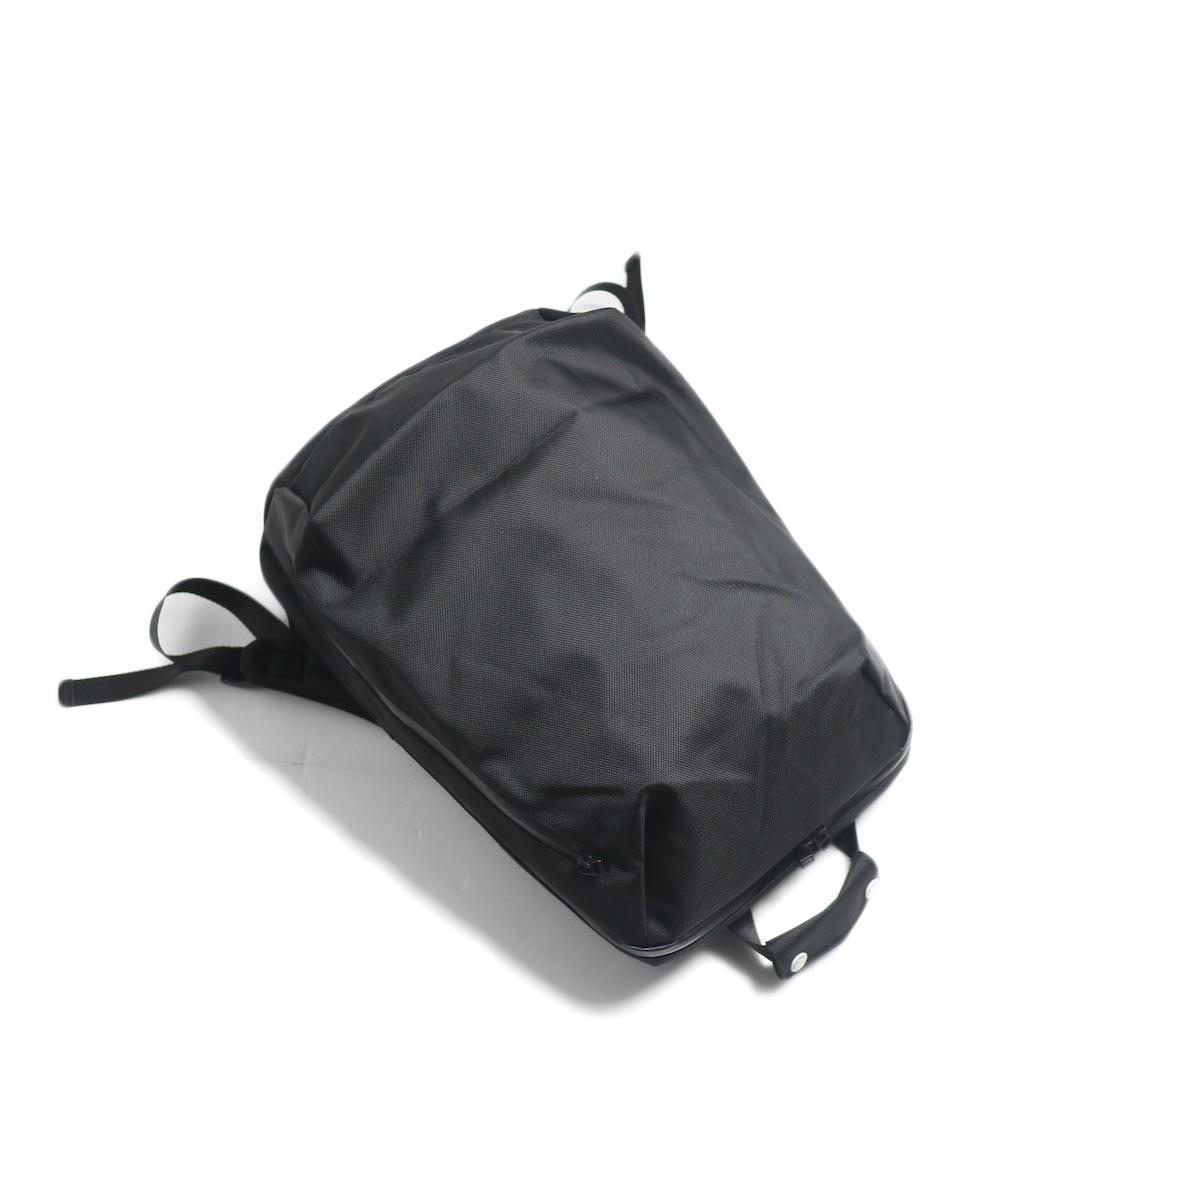 UNIVERSAL PRODUCTS / New Utility Bag -Black ナナメ